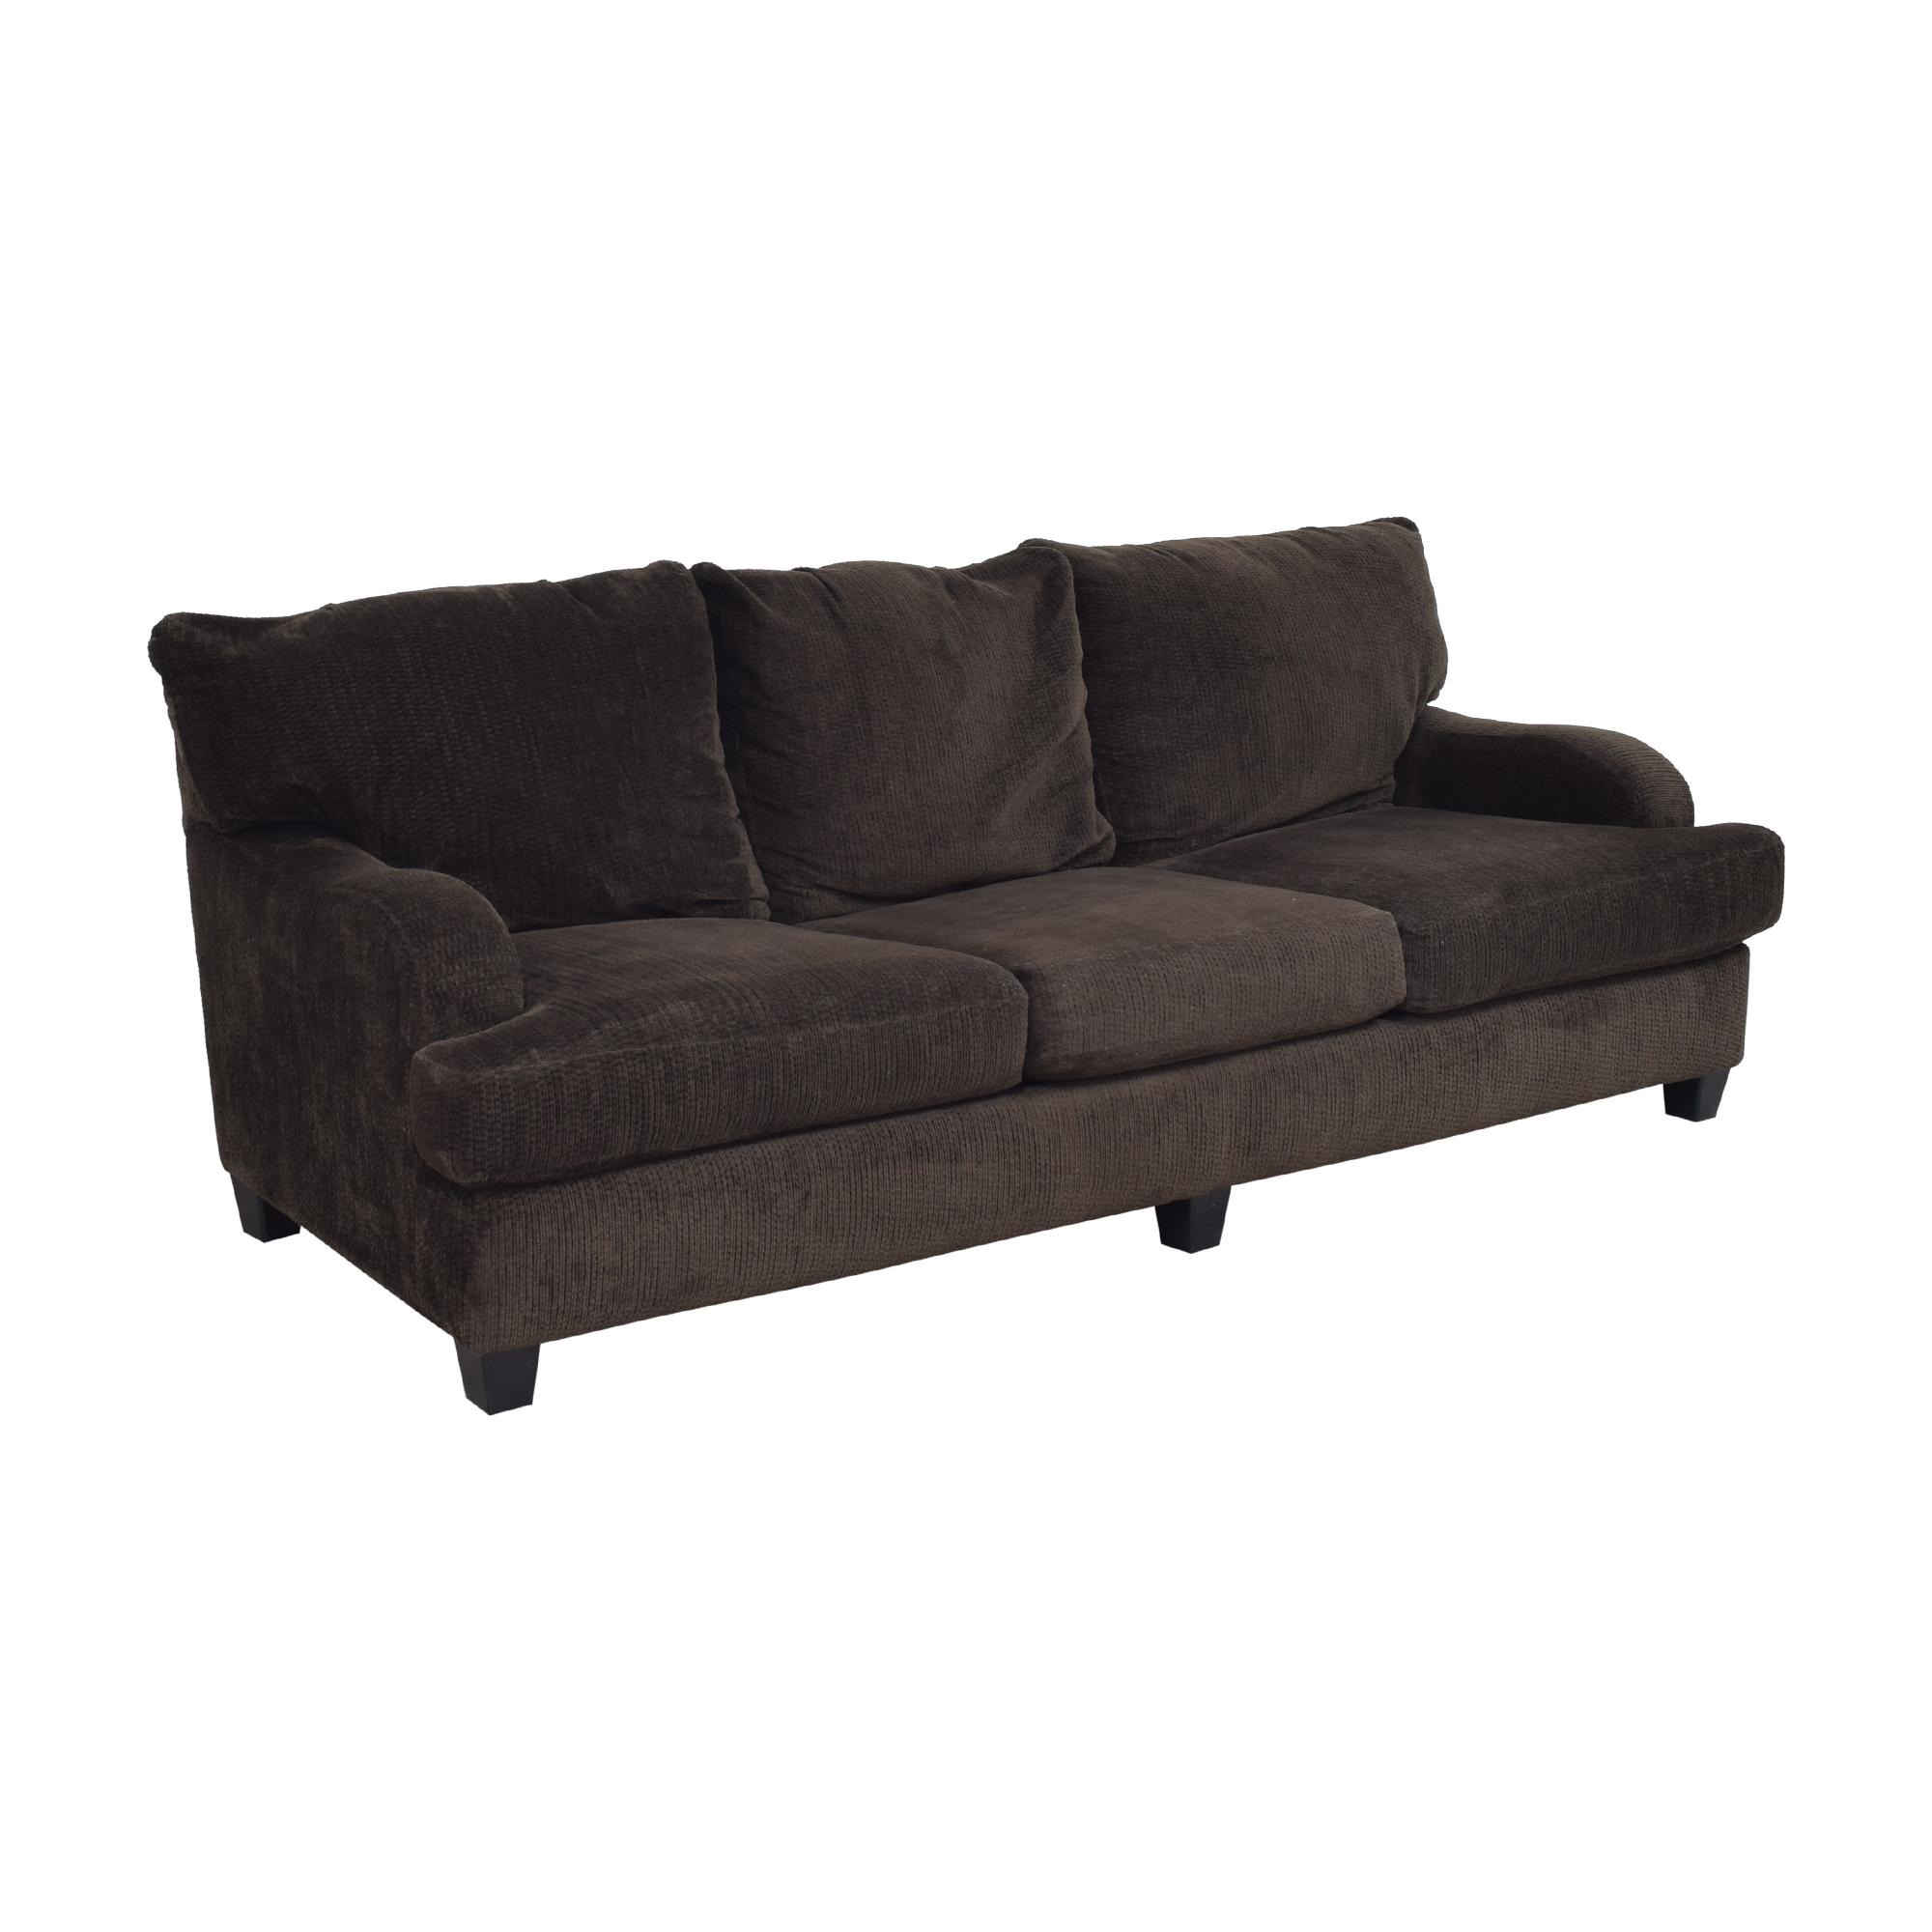 Raymour & Flanigan Raymour & Flanigan Three Cushion Sofa dimensions